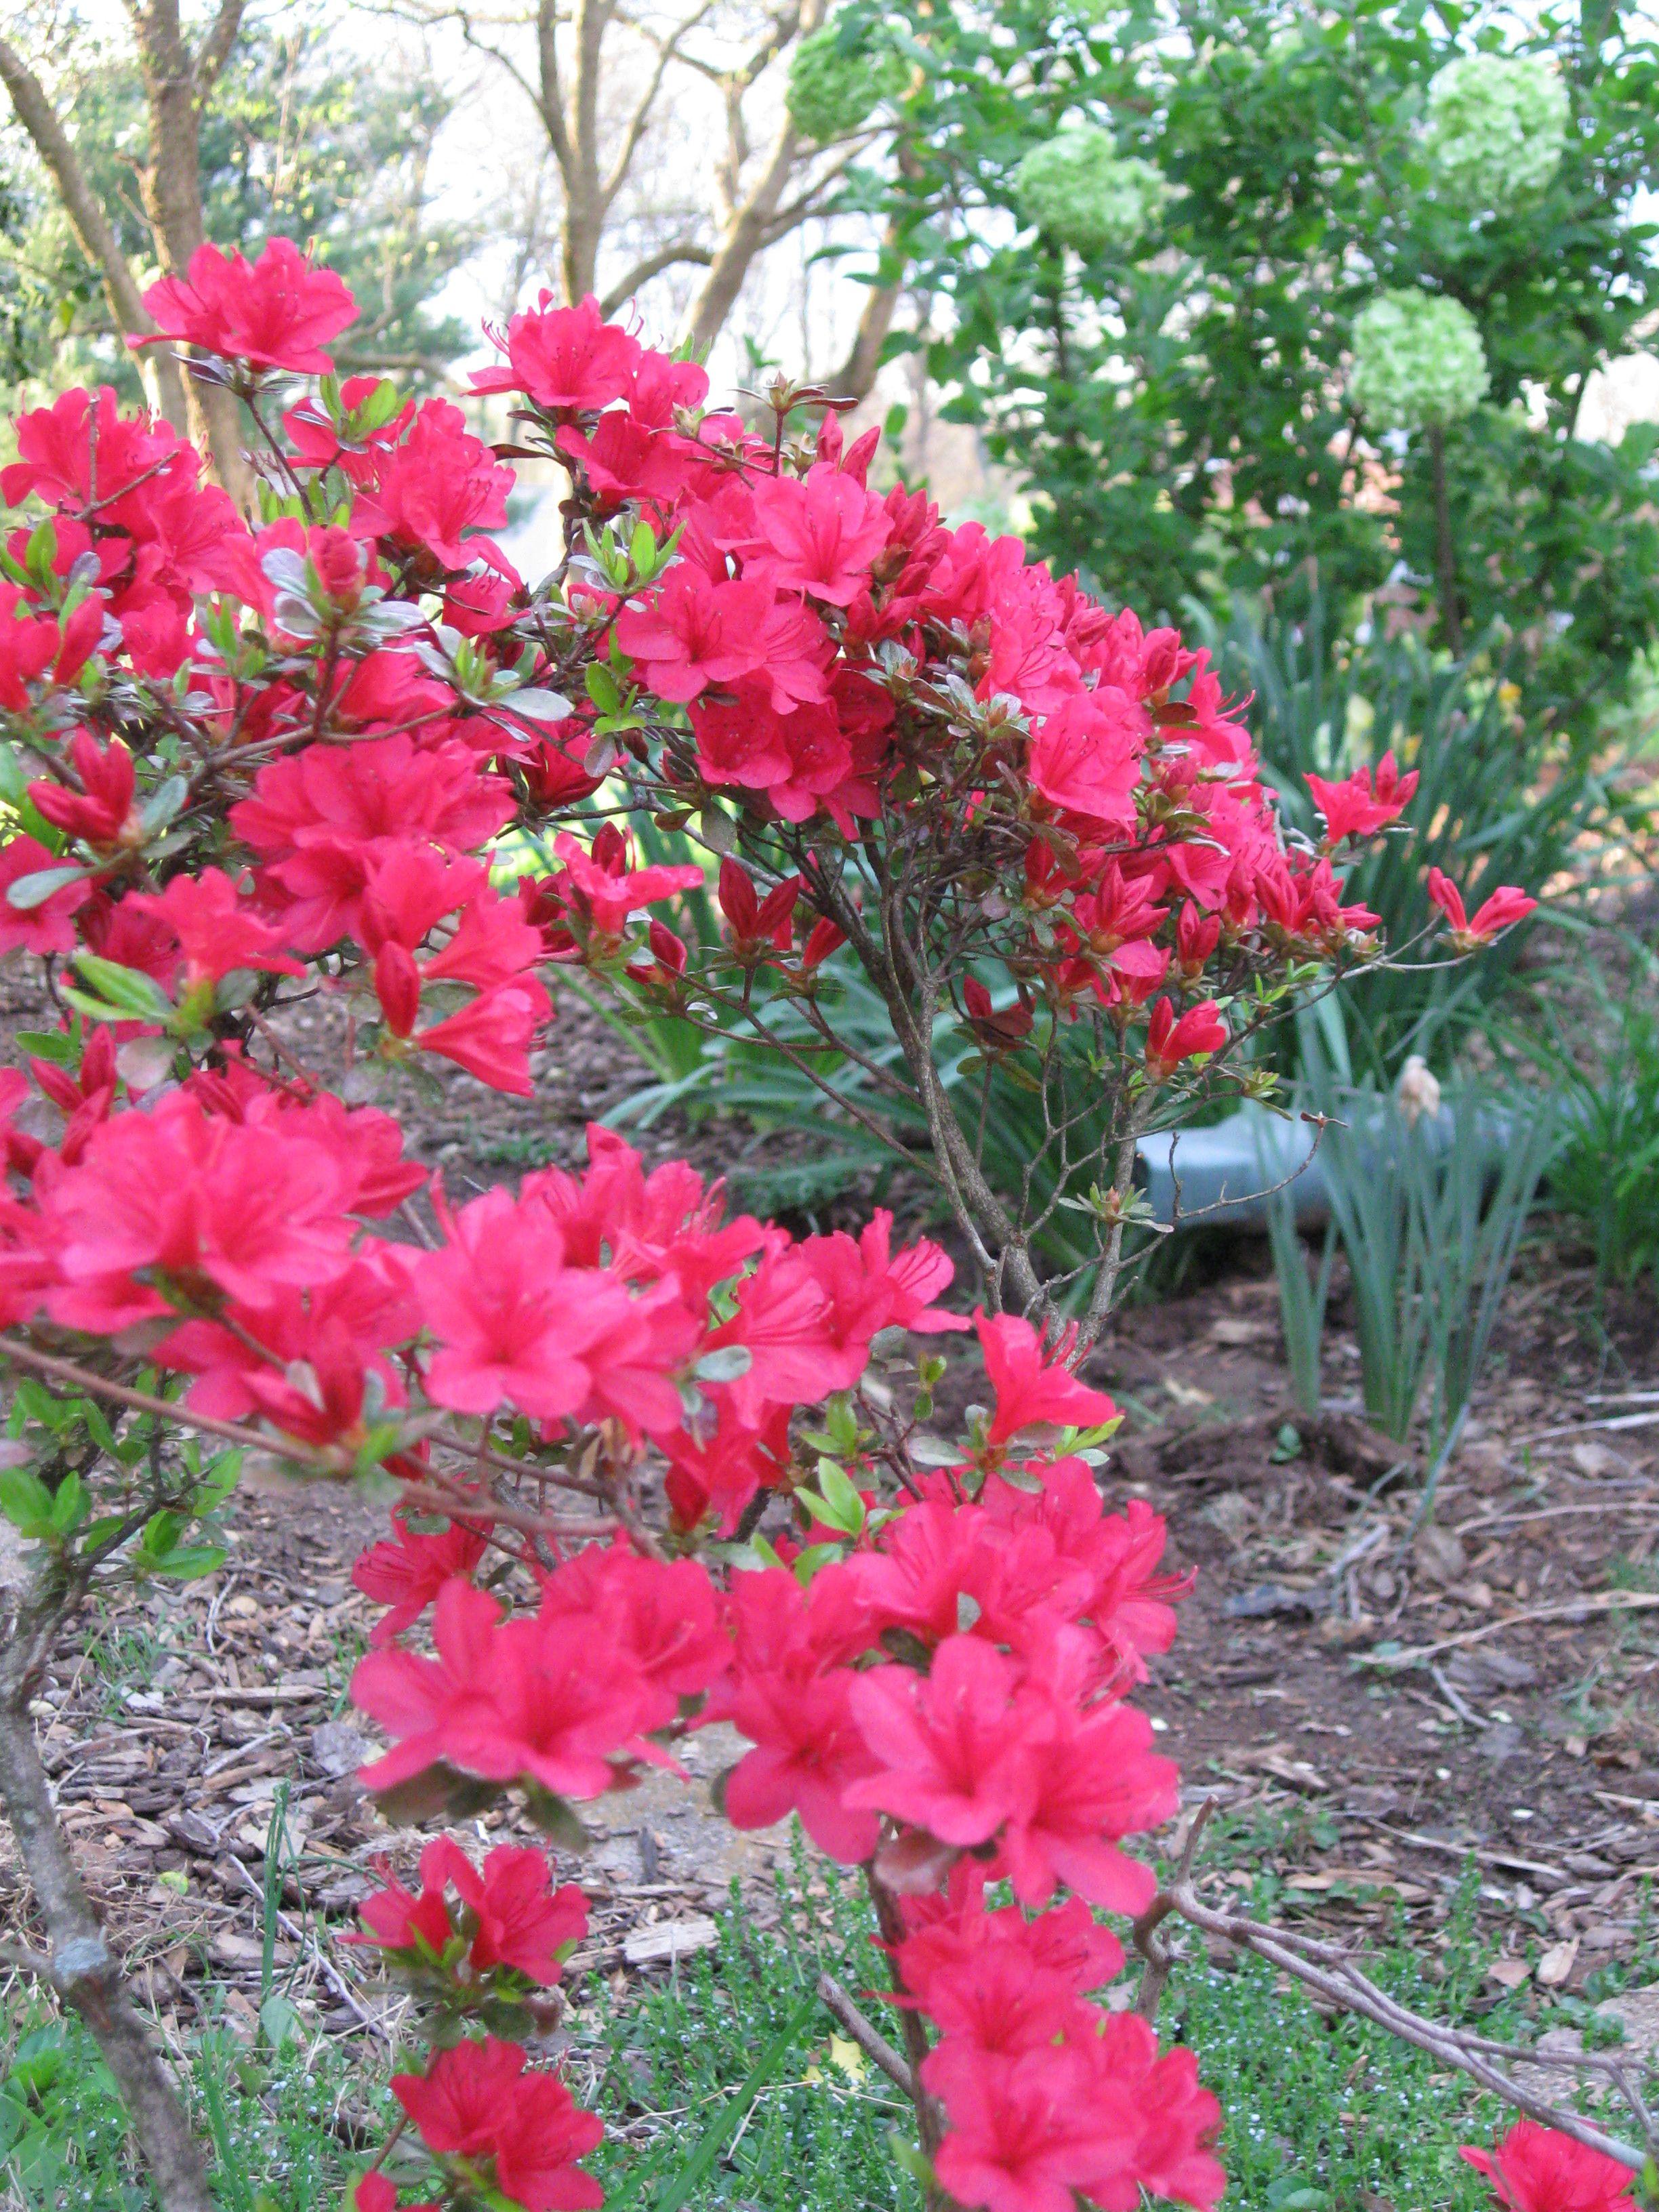 Myrtle Perennial Ground Cover: Azalea 'Girard's Crimson'